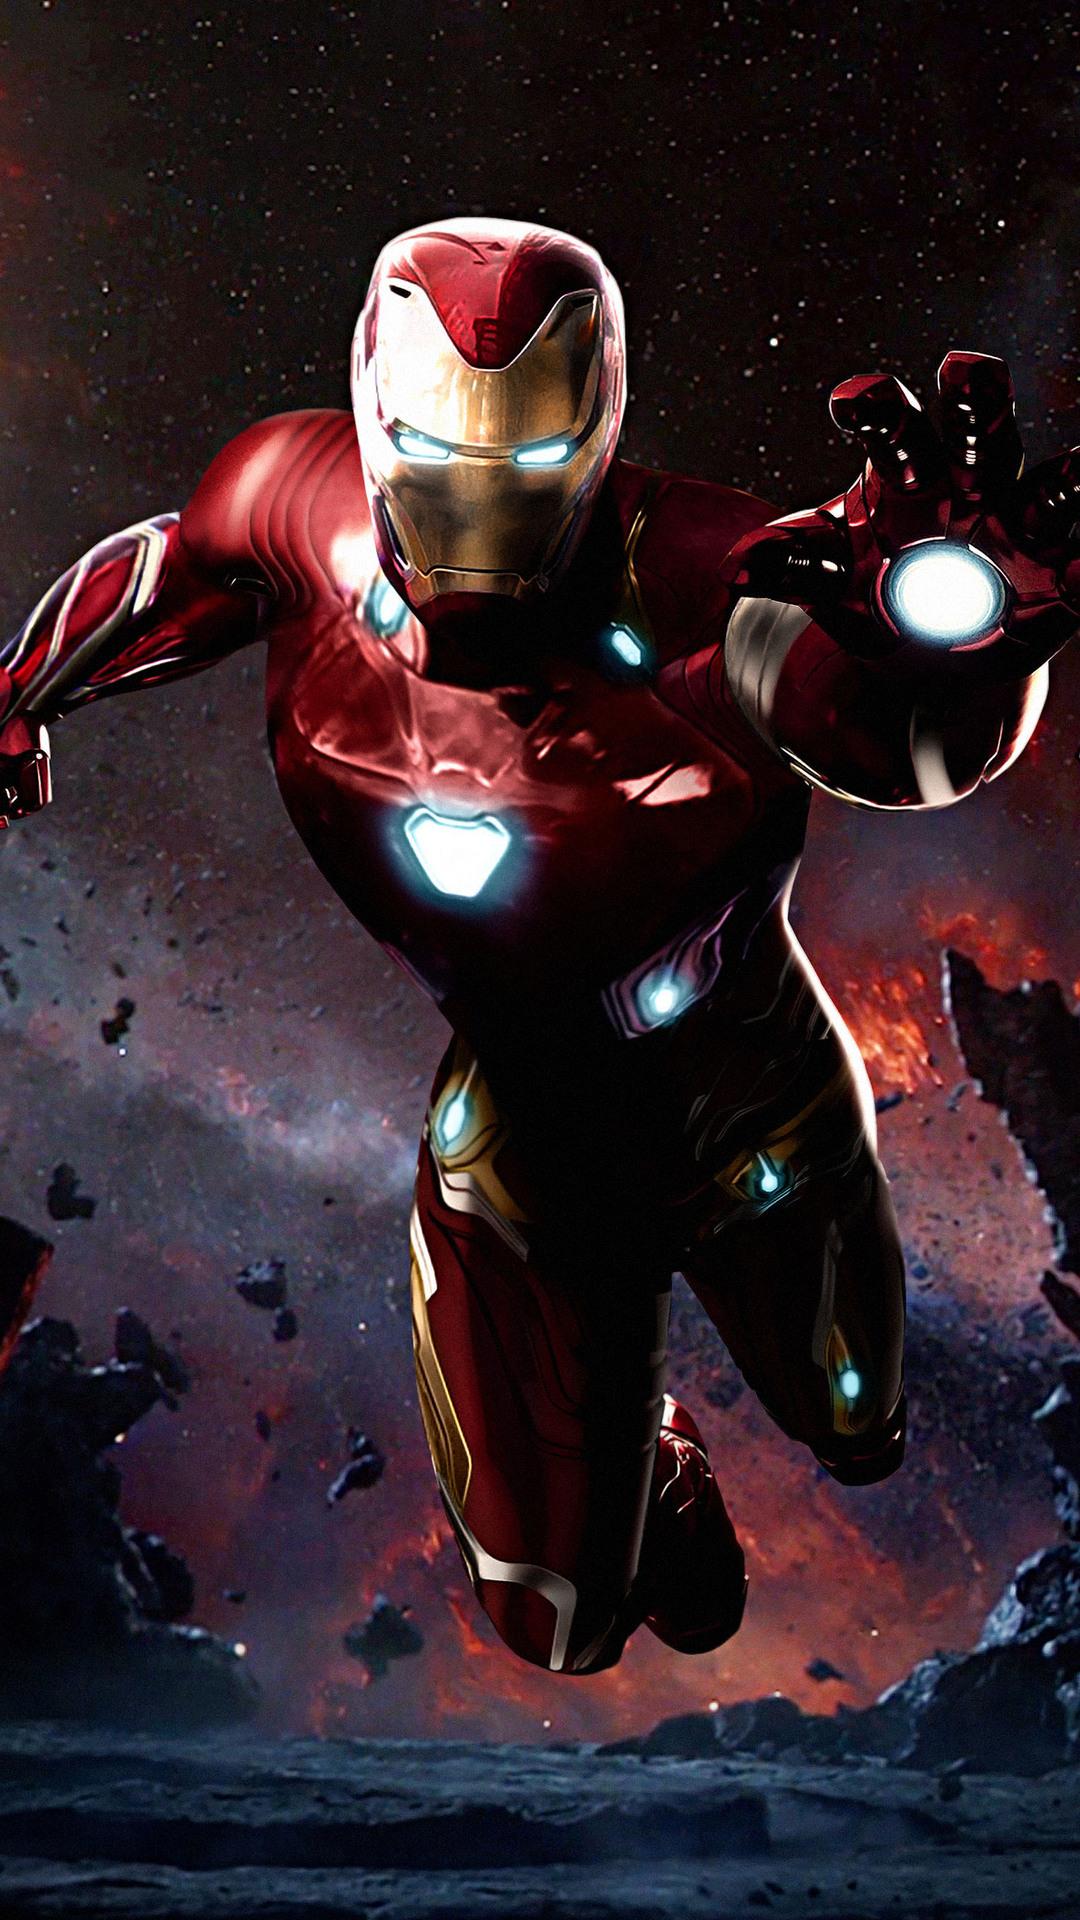 1080x1920 Iron Man Suit In Avengers Infinity War Iphone 7 6s 6 Plus